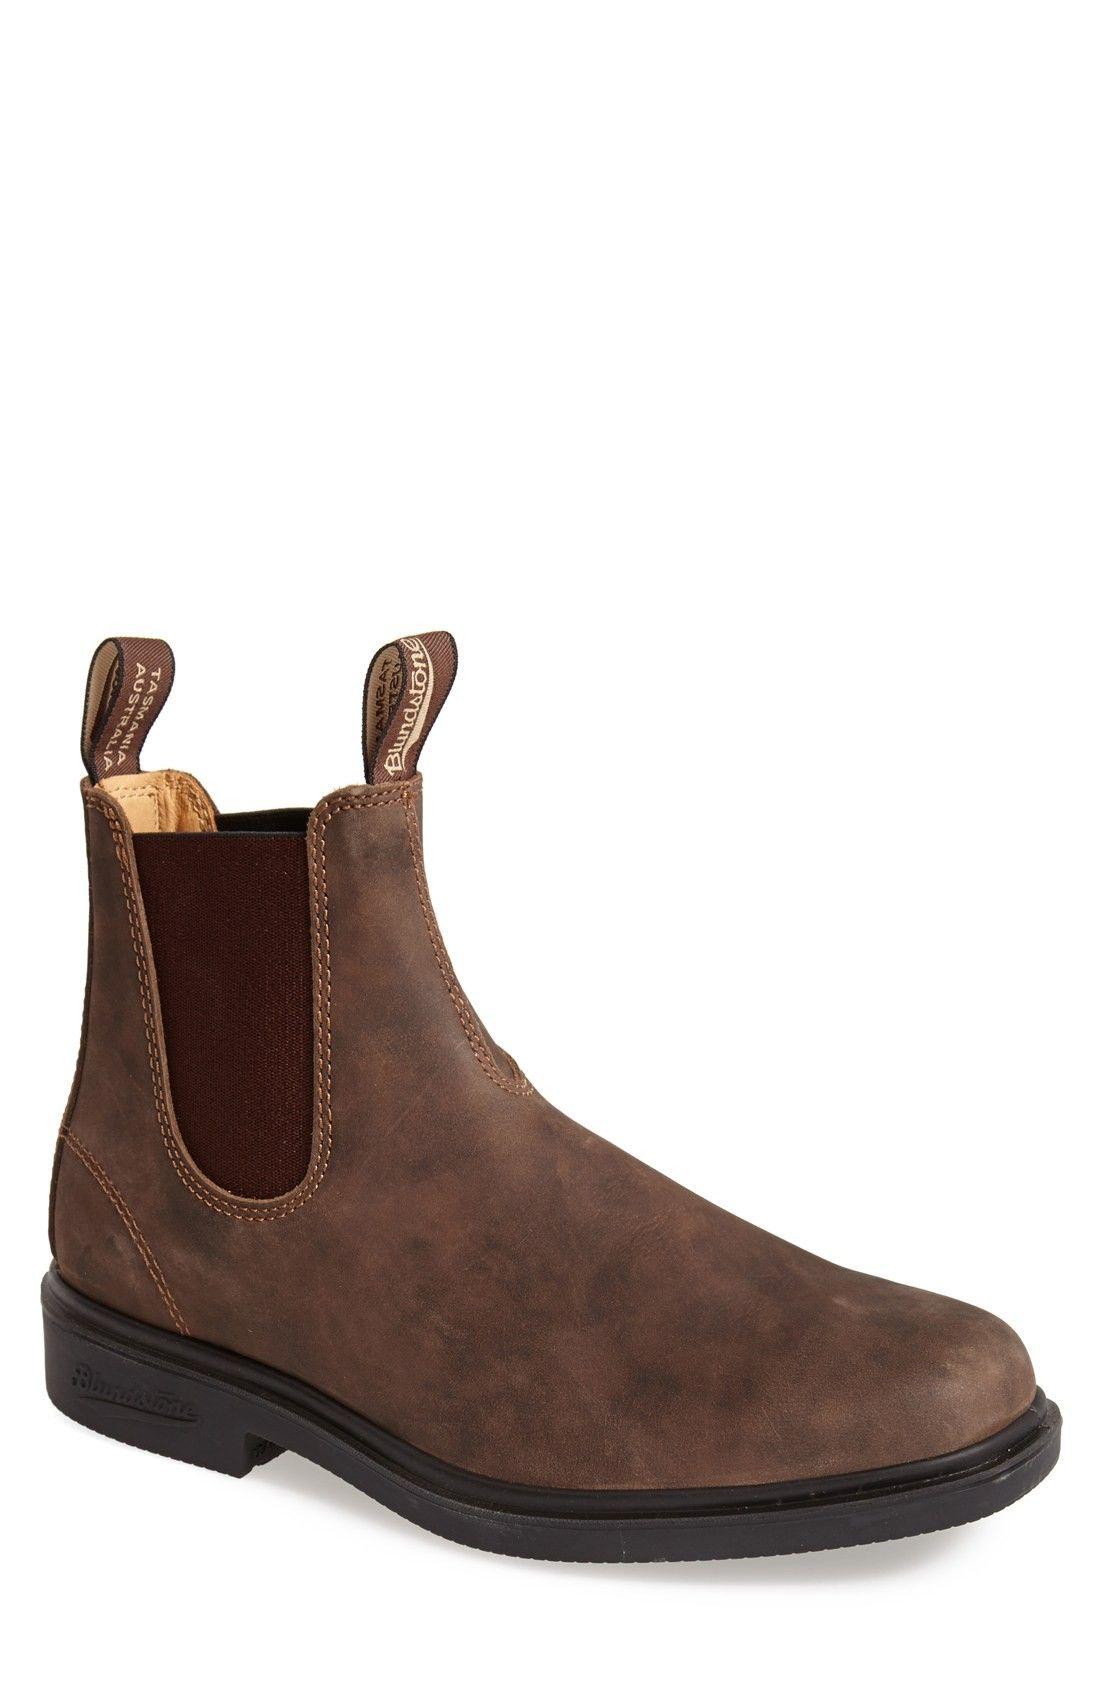 Blundstone Men's Footwear Waterproof Chelsea Boot iXsCV